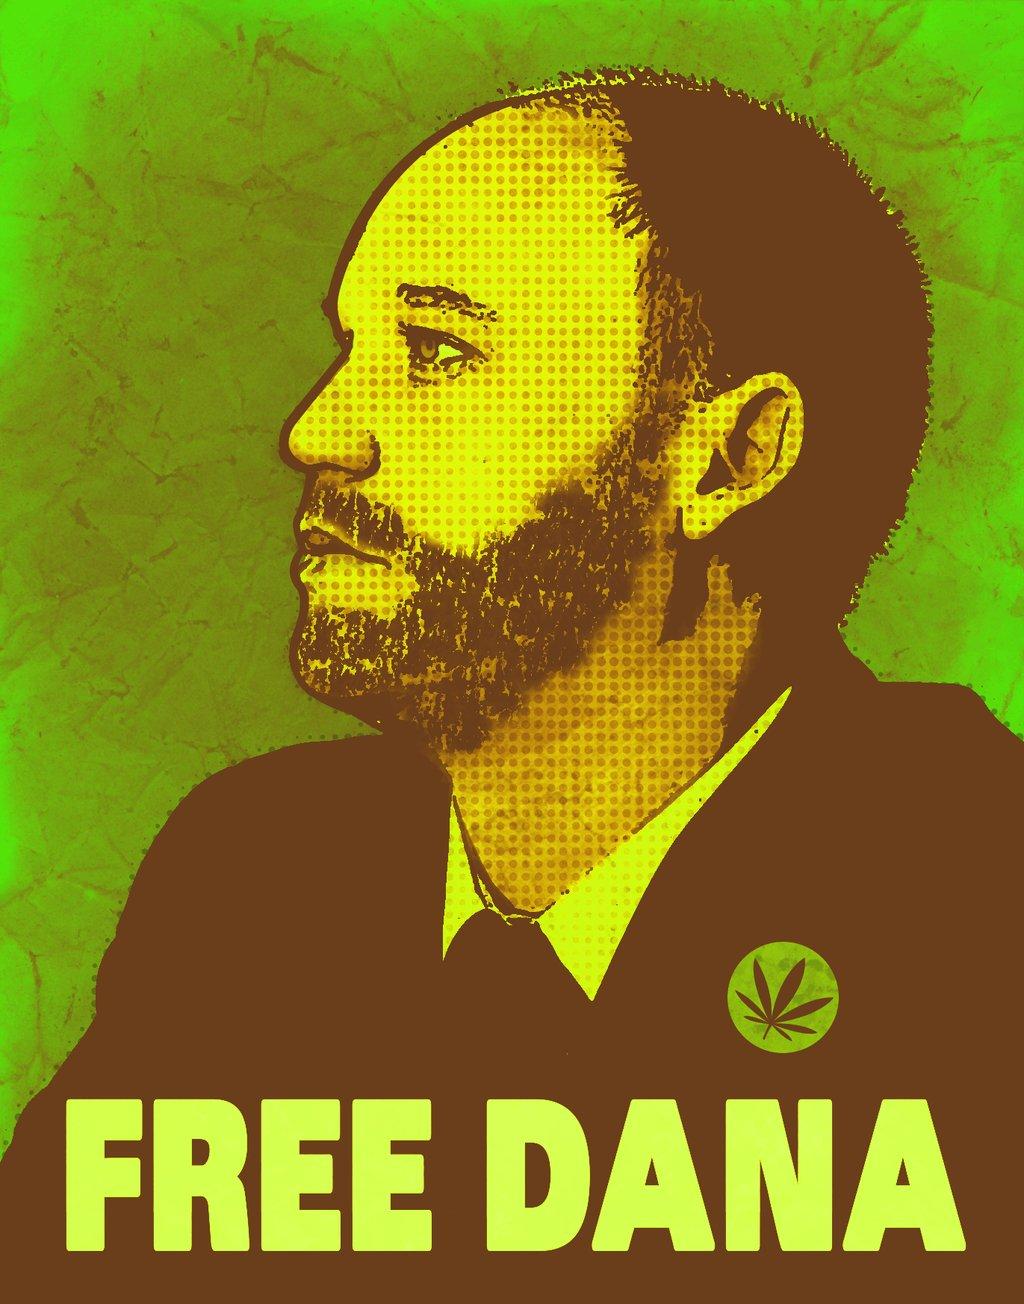 freedana